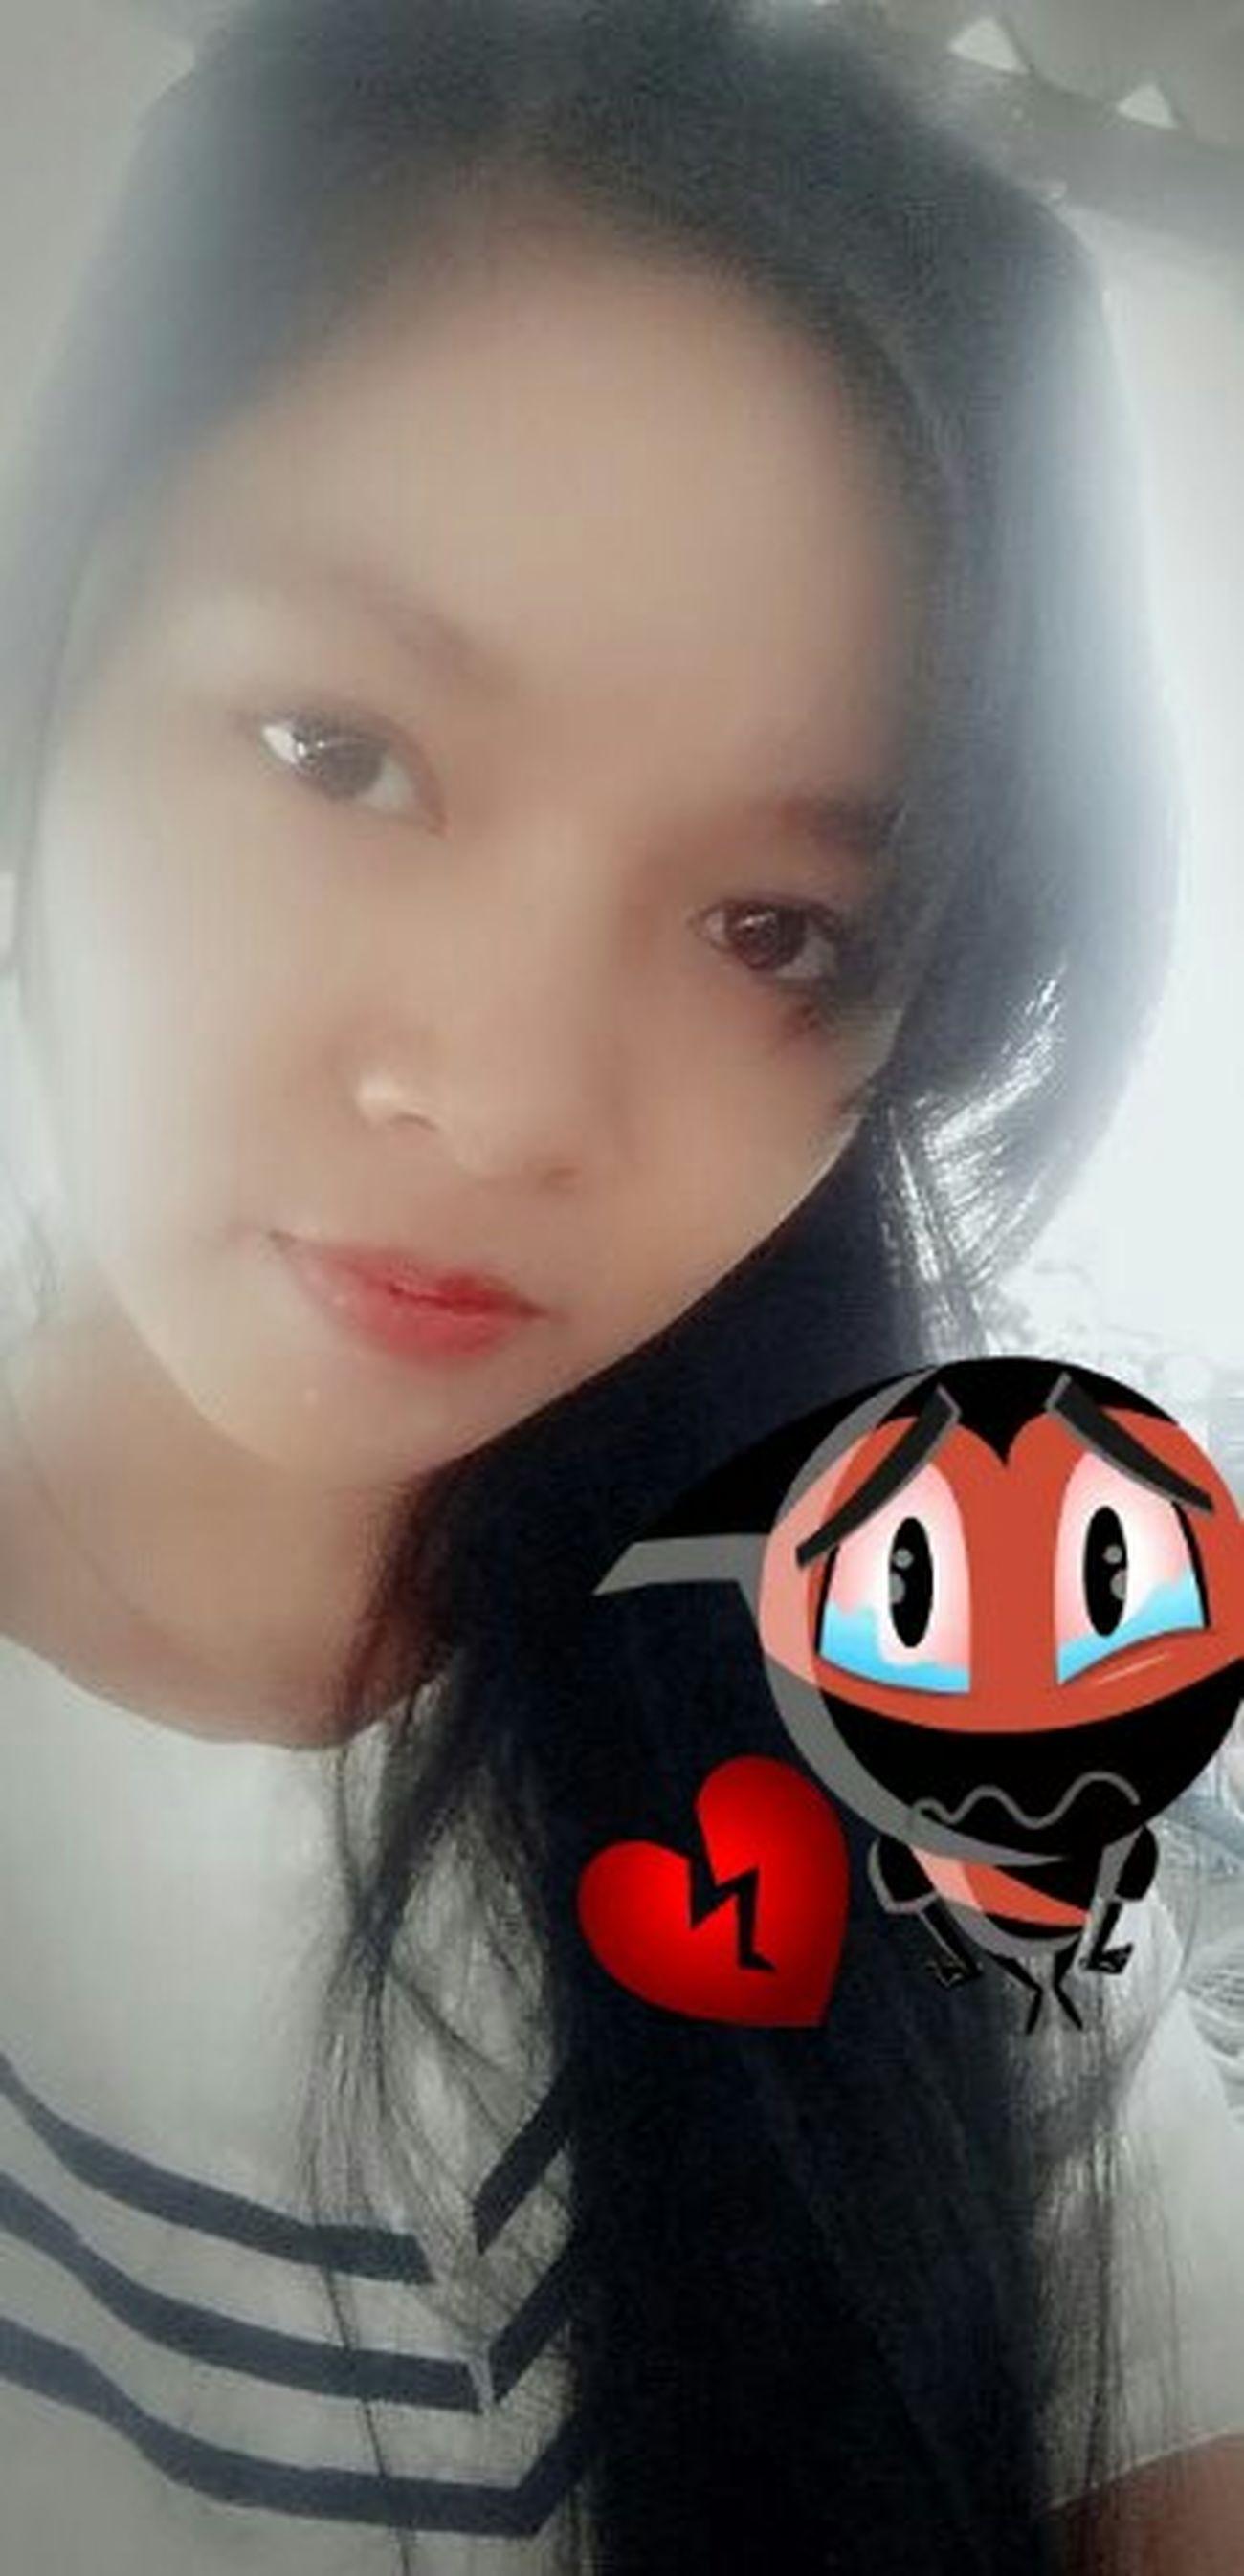 Do U Miss Me? Maybe Not But... ImissYouu♥